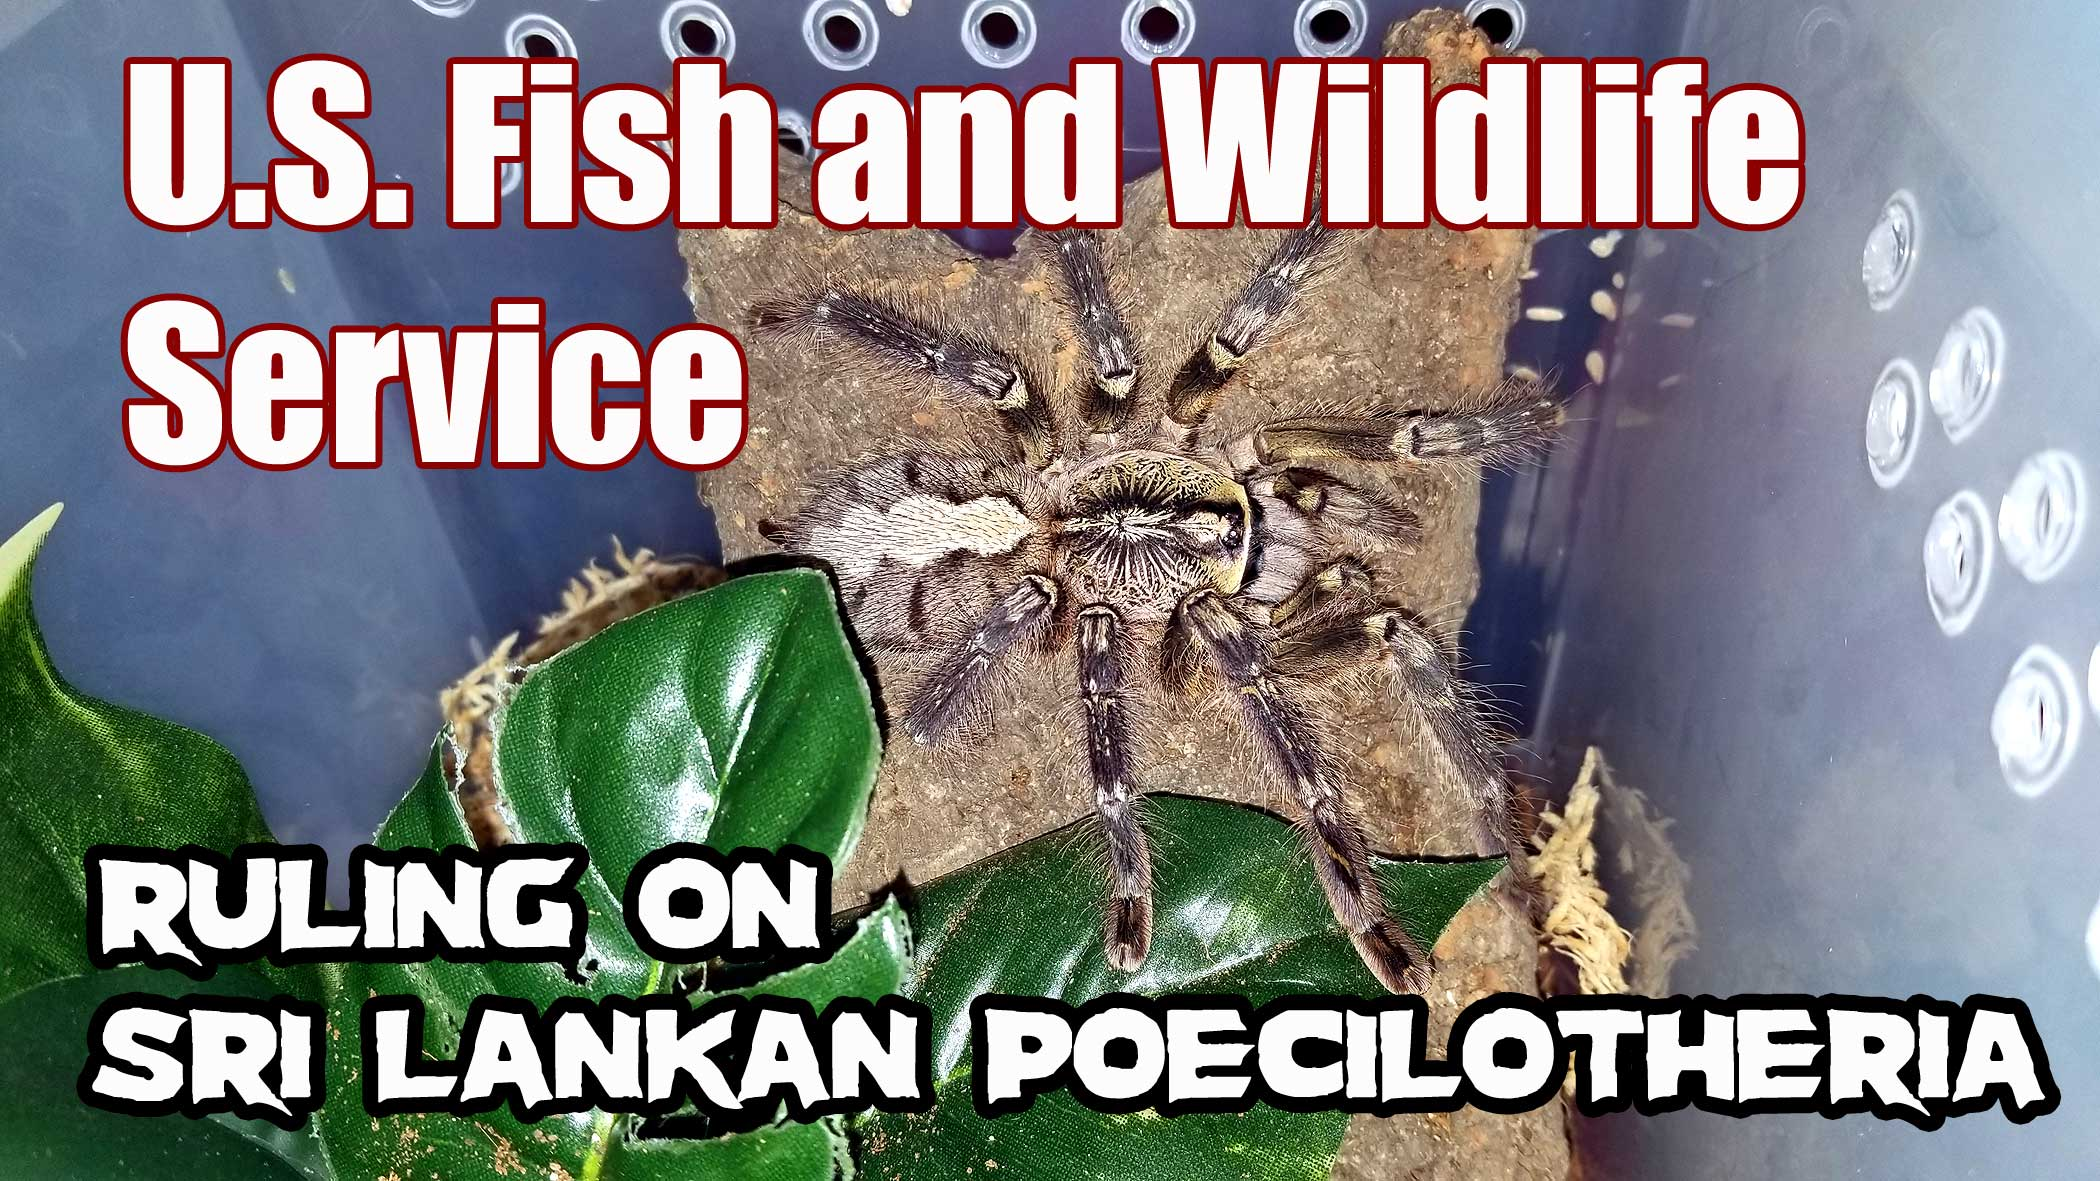 The U S  Fish and Wildlife Service Ruling on Sri Lankan